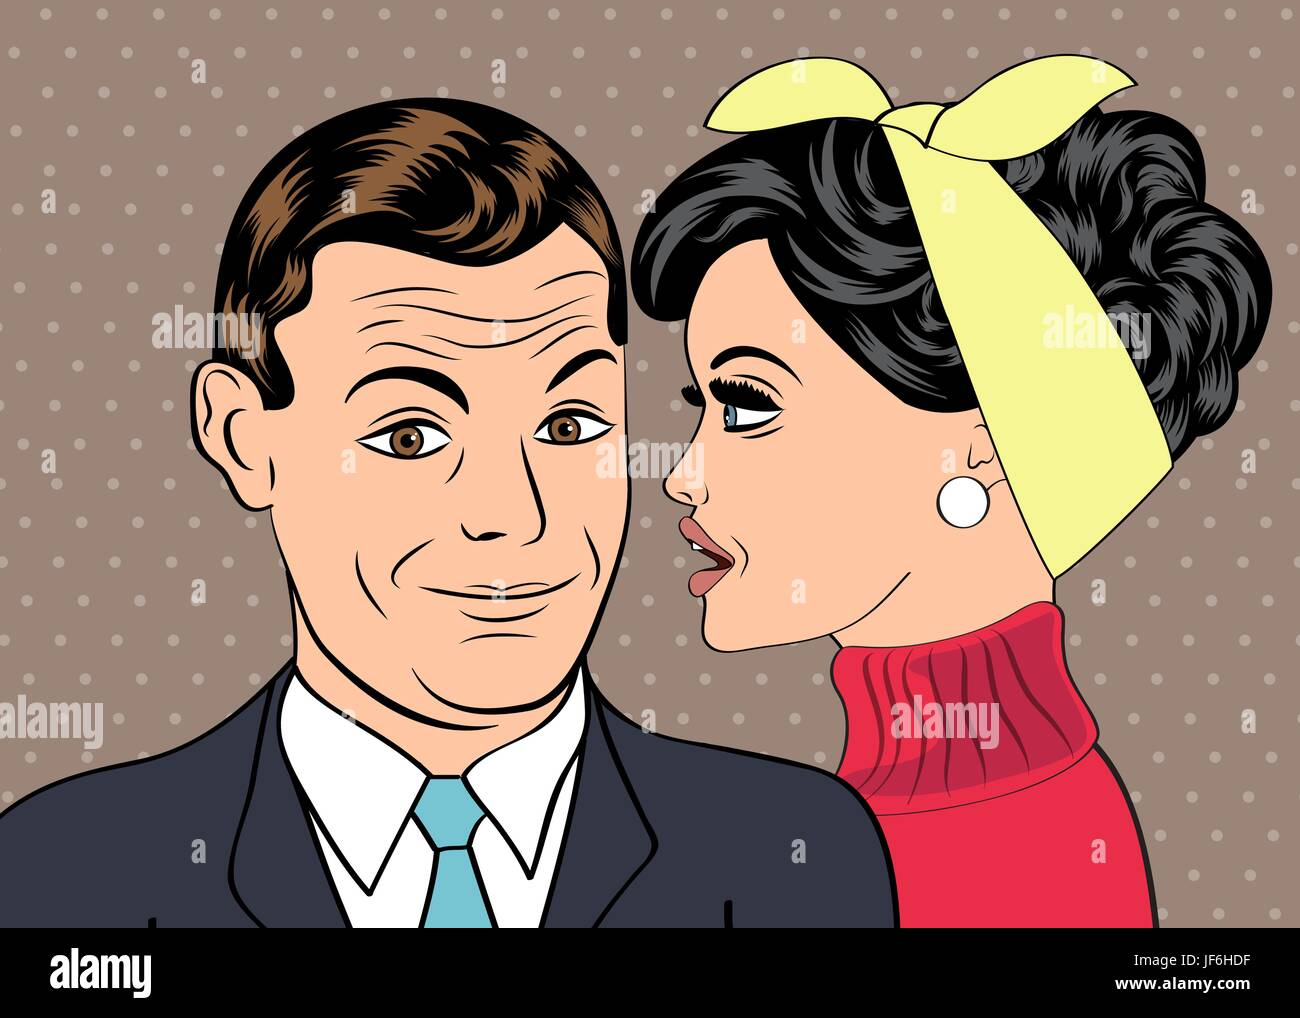 woman, talk, speaking, speaks, spoken, speak, talking, chat, nattering, art, - Stock Vector